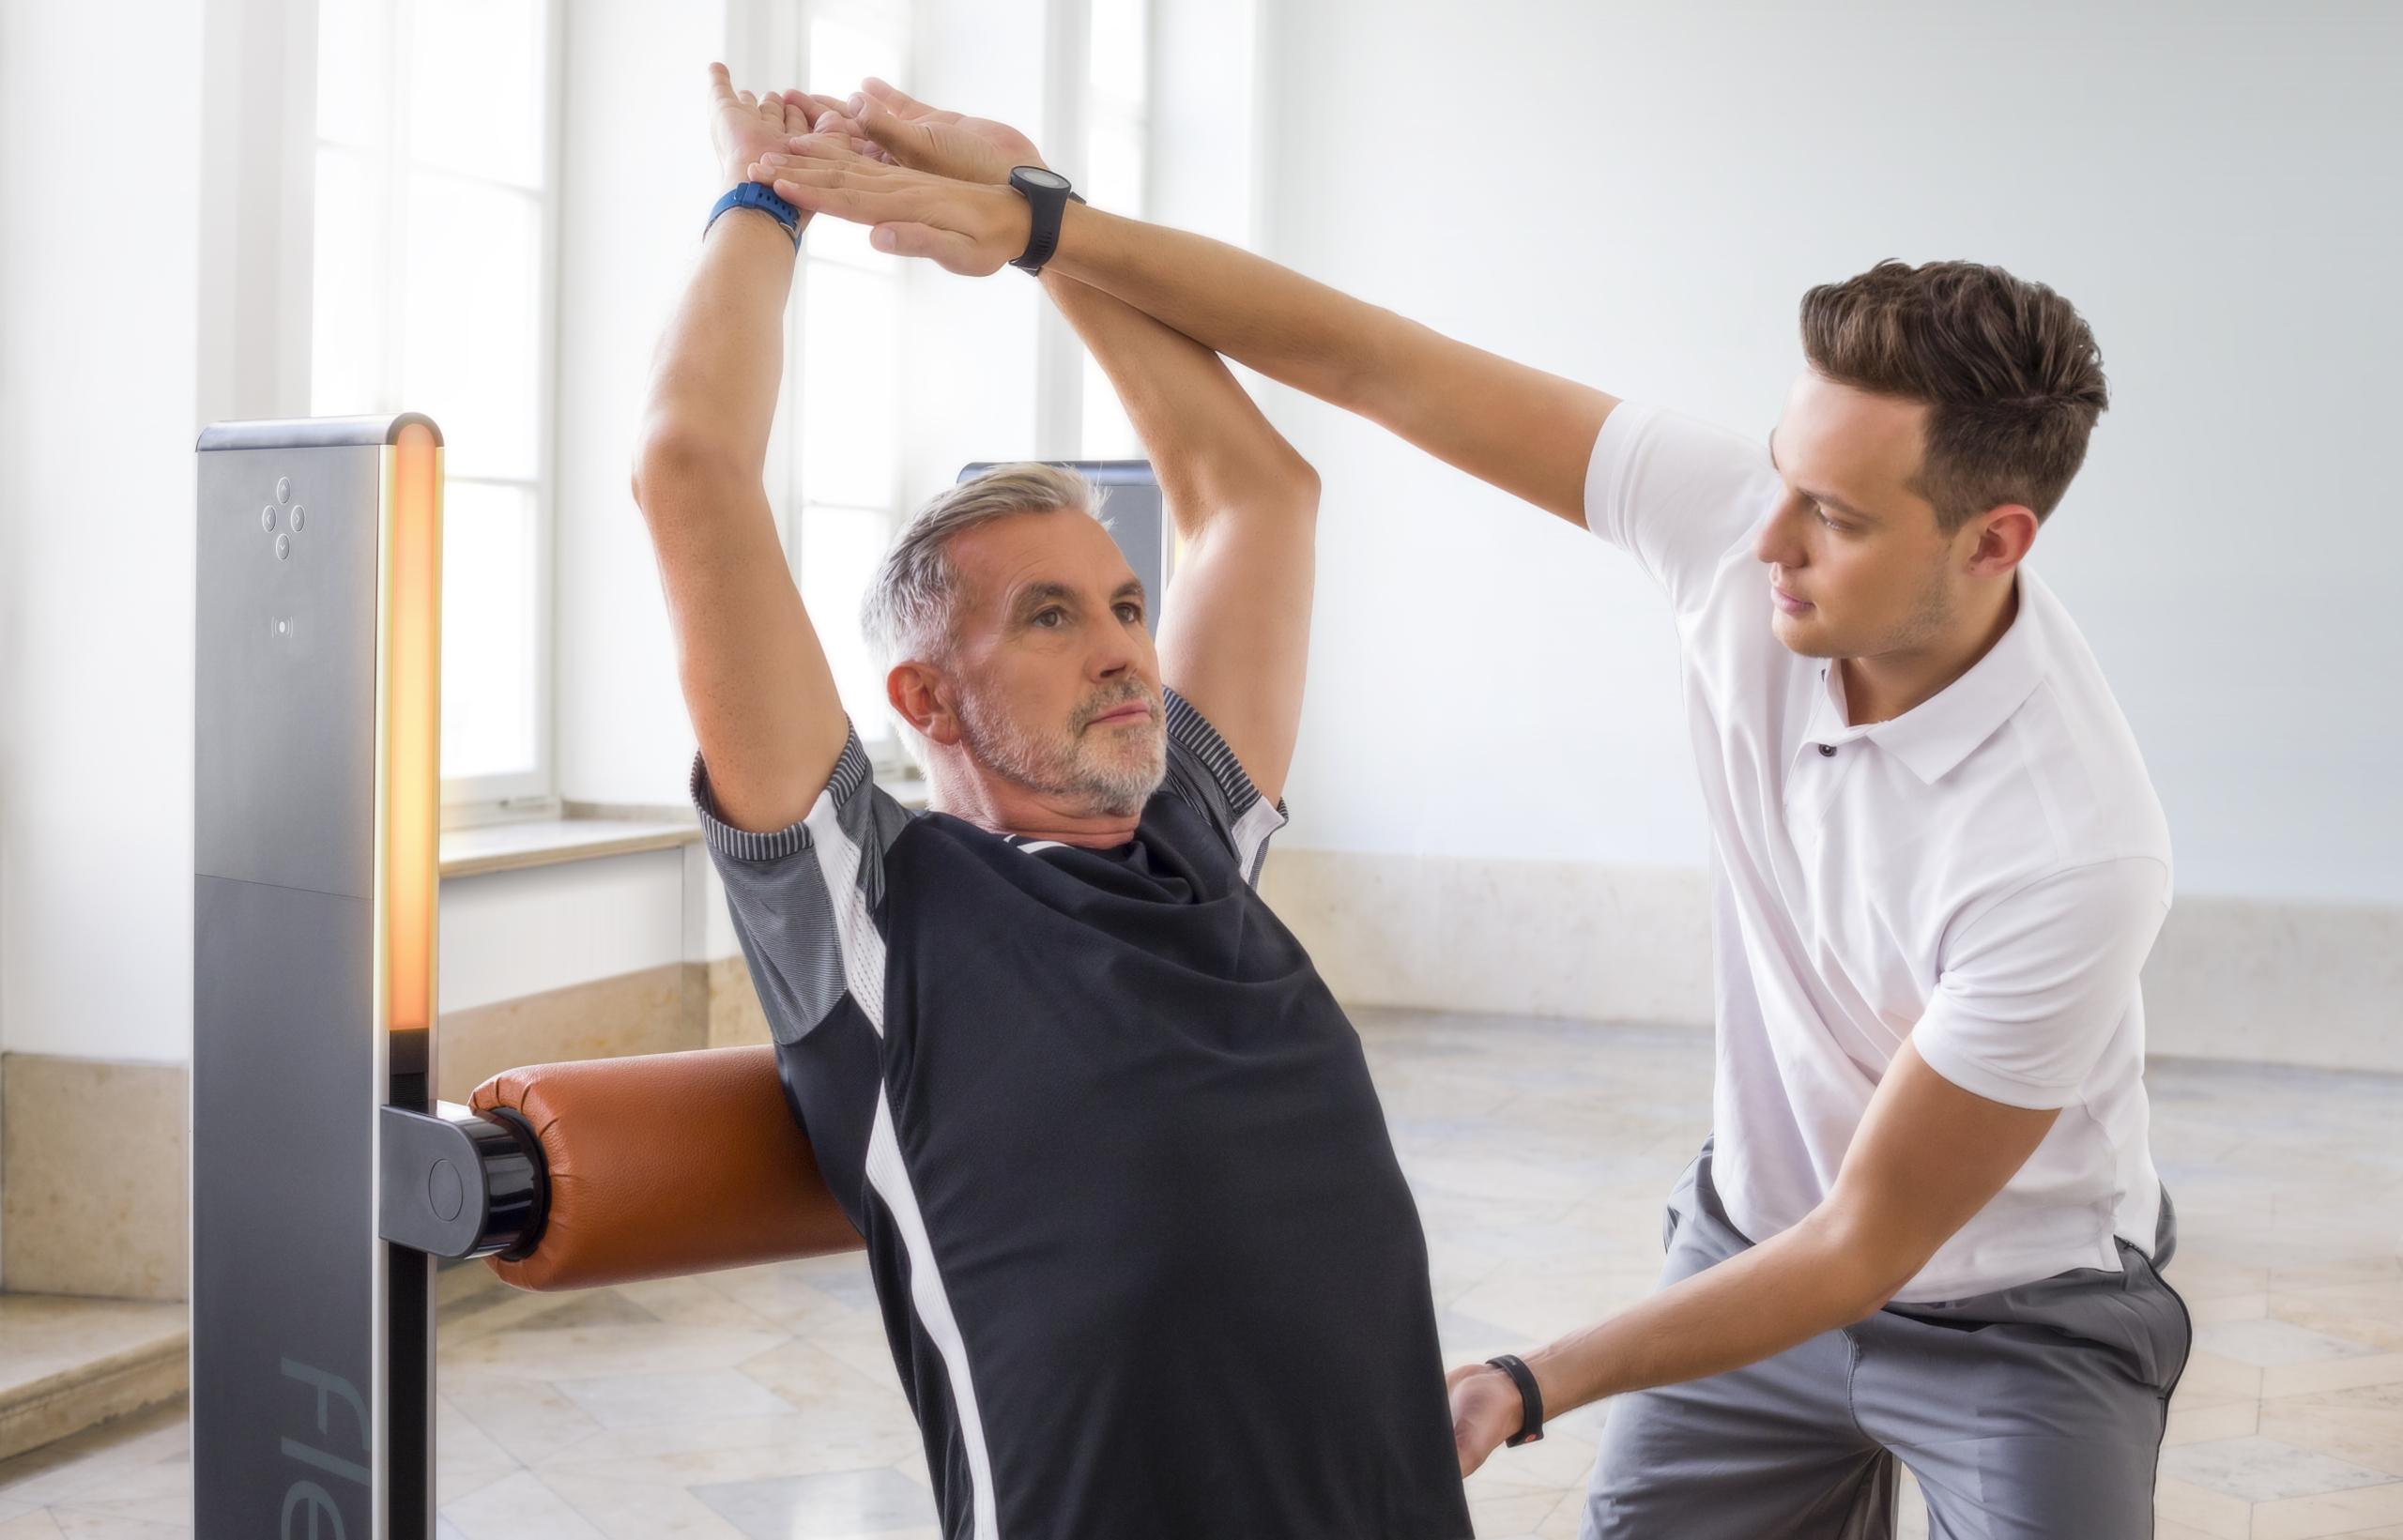 Übung-bei-Rückenschmerzen